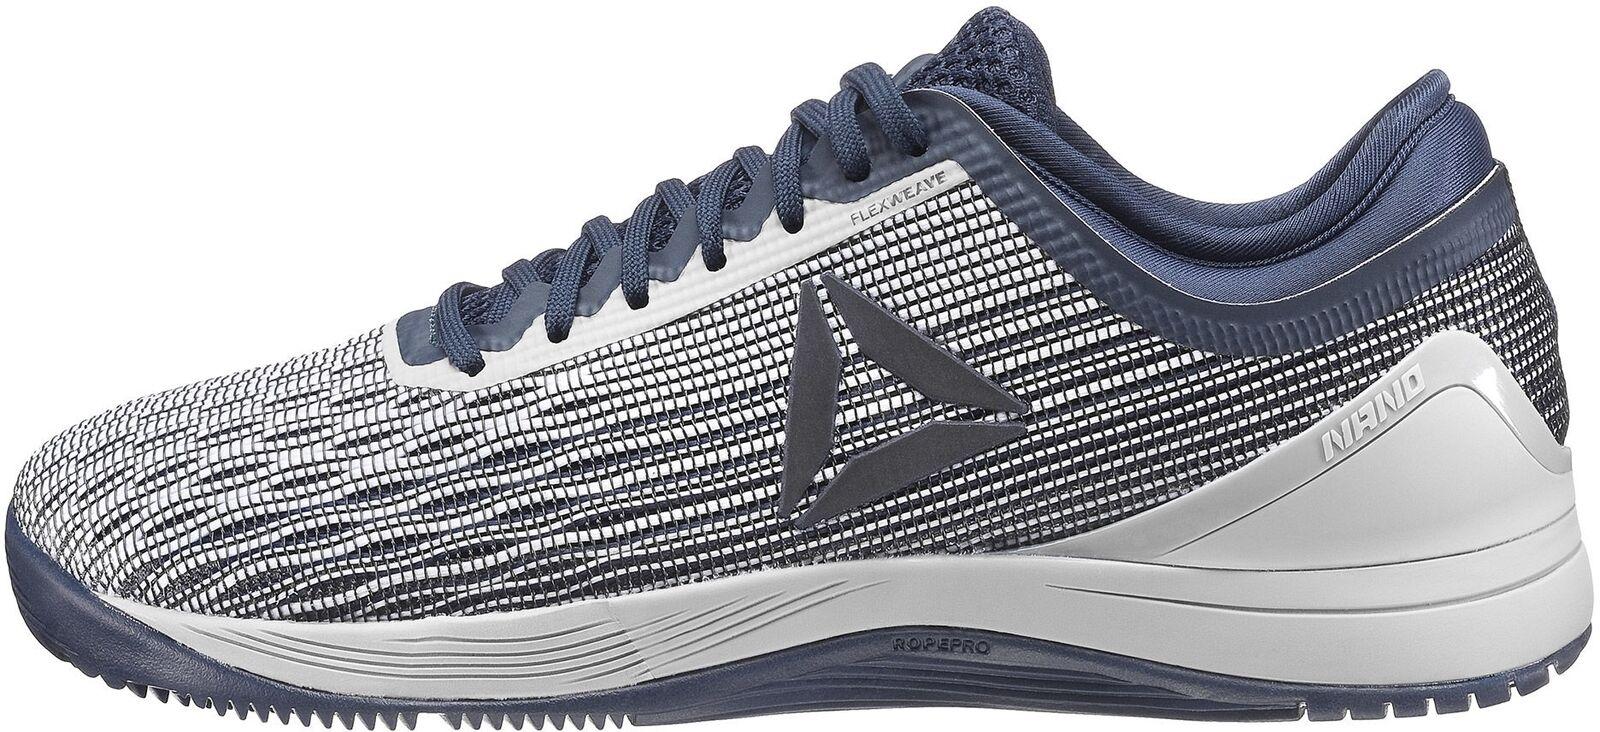 Reebok Crossfit Nano 8 Flexweave Mens Training shoes – White